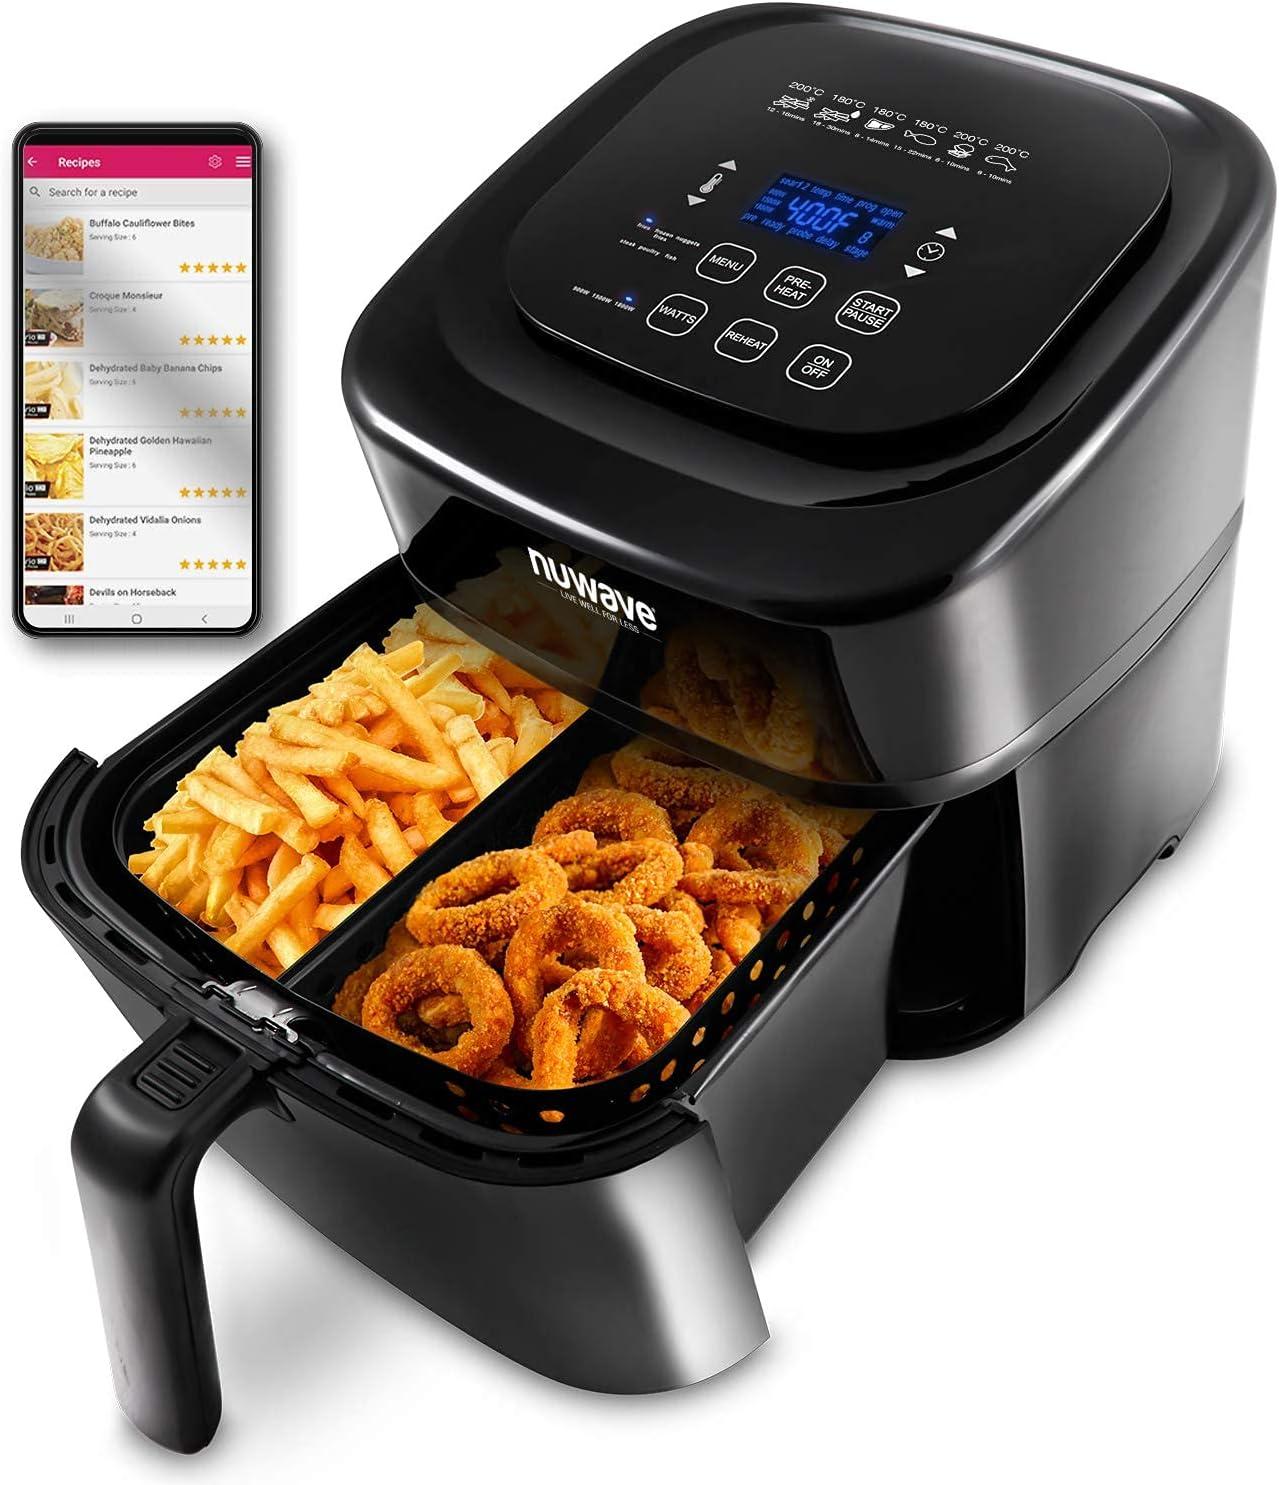 NUWAVE BRIO 6-Quart Digital Air Fryer with One-Touch Digital Controls, 6 easy presets, Precise Temperature Control, Recipe Book, Basket Divider, Wattage Control, PREHEAT & REHEAT Function (Renewed)